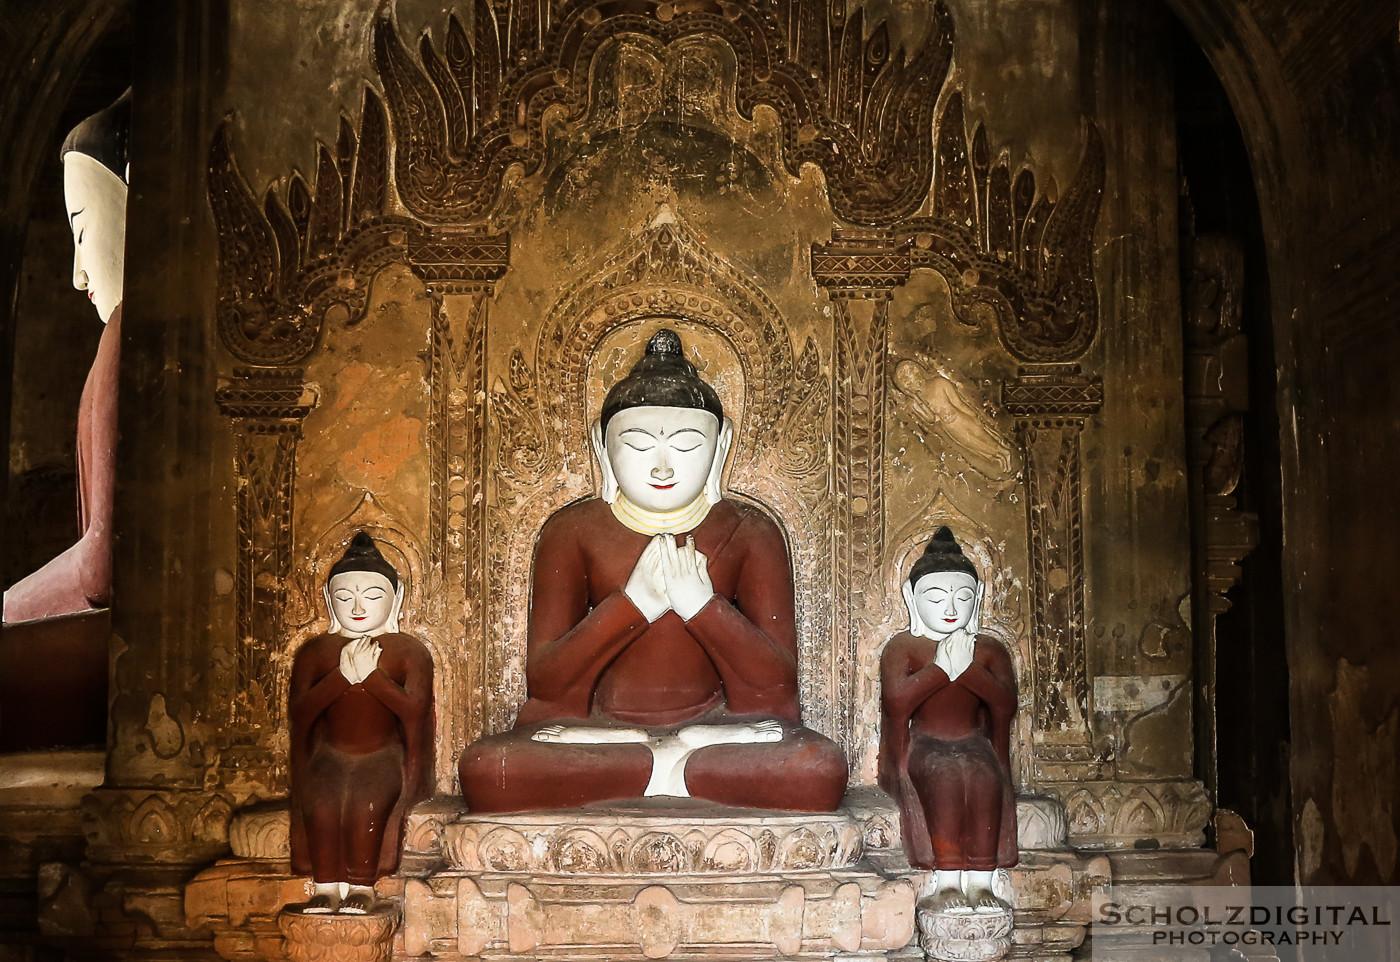 Urbex, Lost Place, Abandoned, verlassene Orte, verlassen, verlaten, Urban exploration, Bagan, Travelling, Myanmar, Birma, Burma, Tambadipa, tempel, tempelfeld, Buddha, Mandalay-Division,